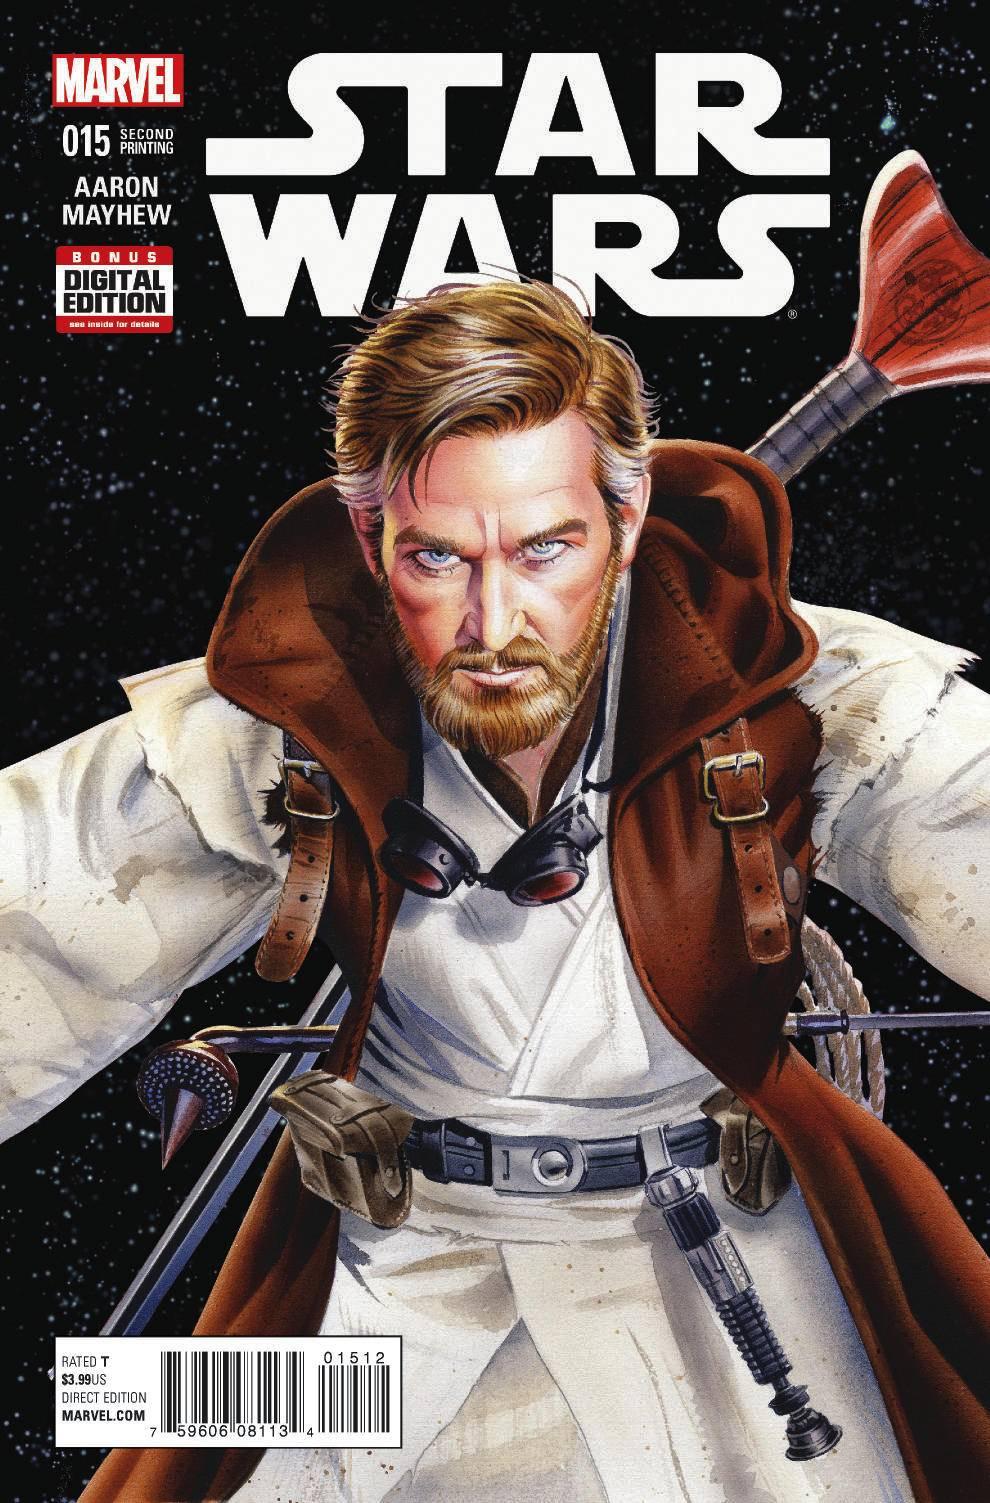 Star Wars #15 (2nd Printing) (09.03.2016)